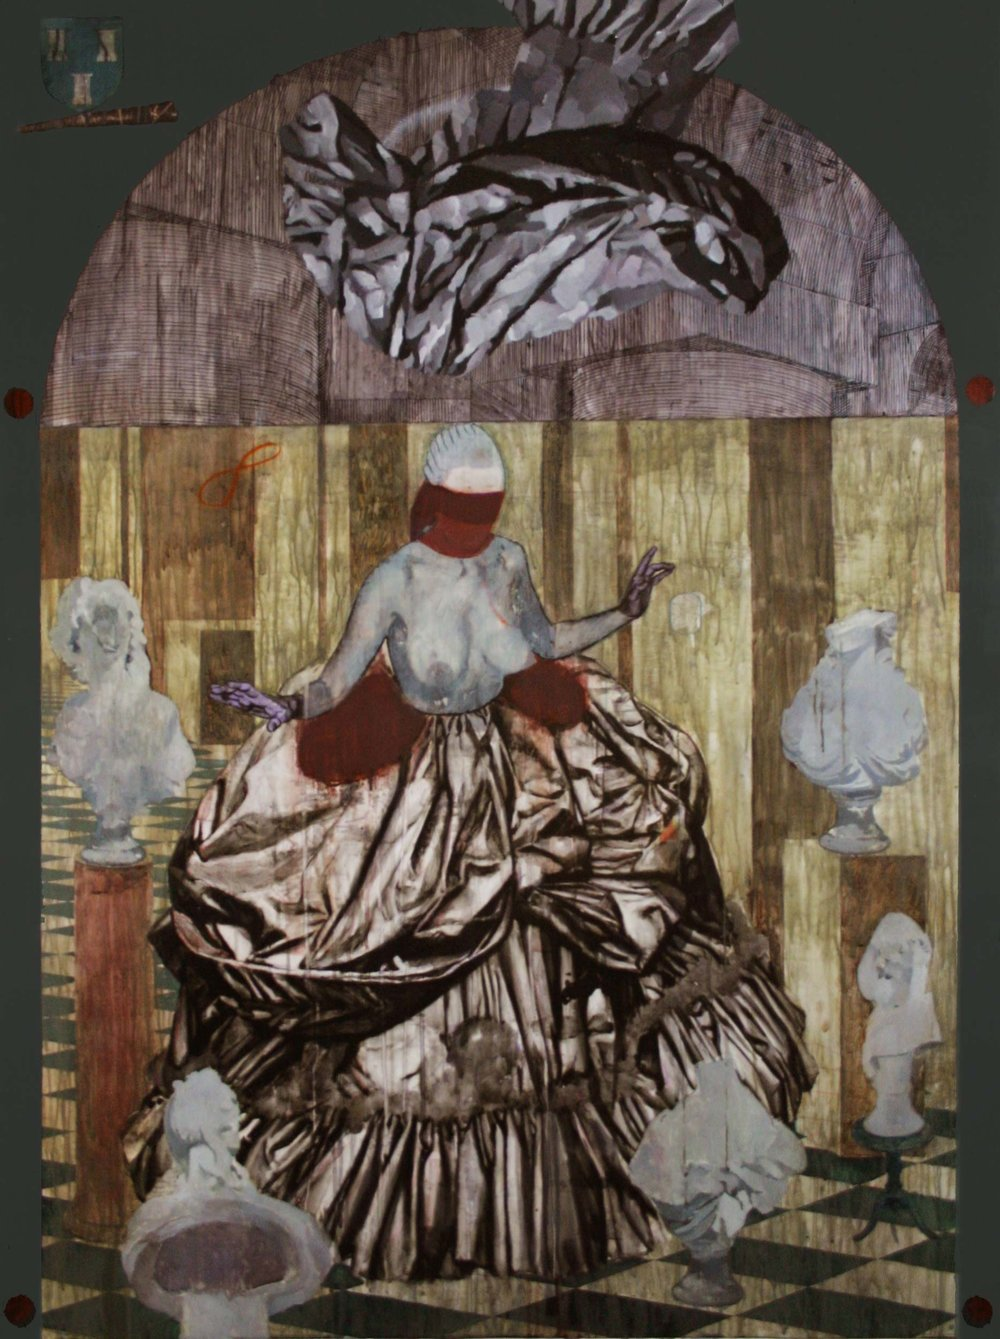 Le Colin-maillard ou la collection en jeu  2016, Mixed media on drafting film 150 x 111 cm